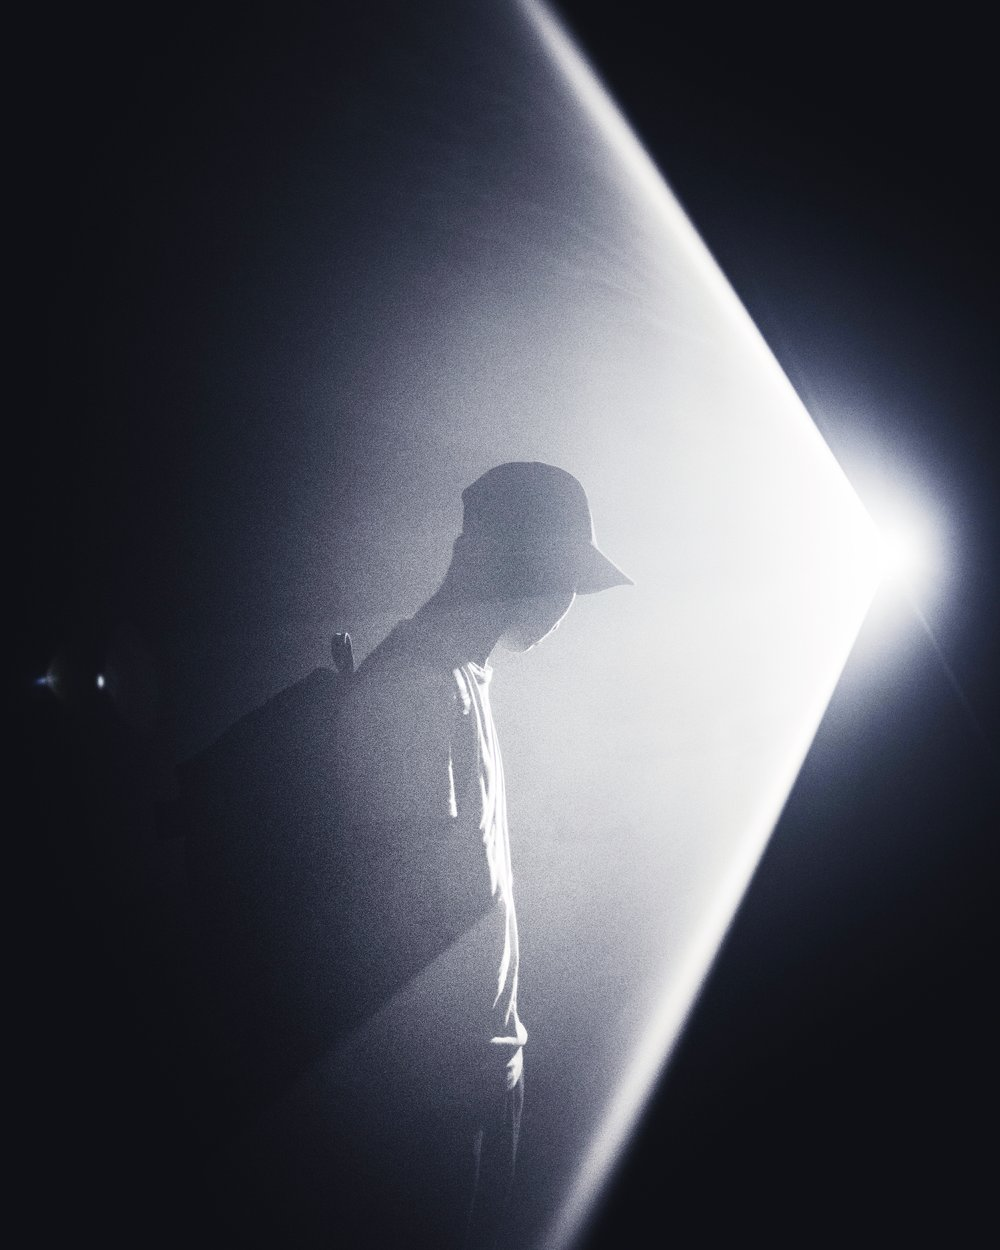 Defy the darkness, Light them up. @GOHSHAOKAI